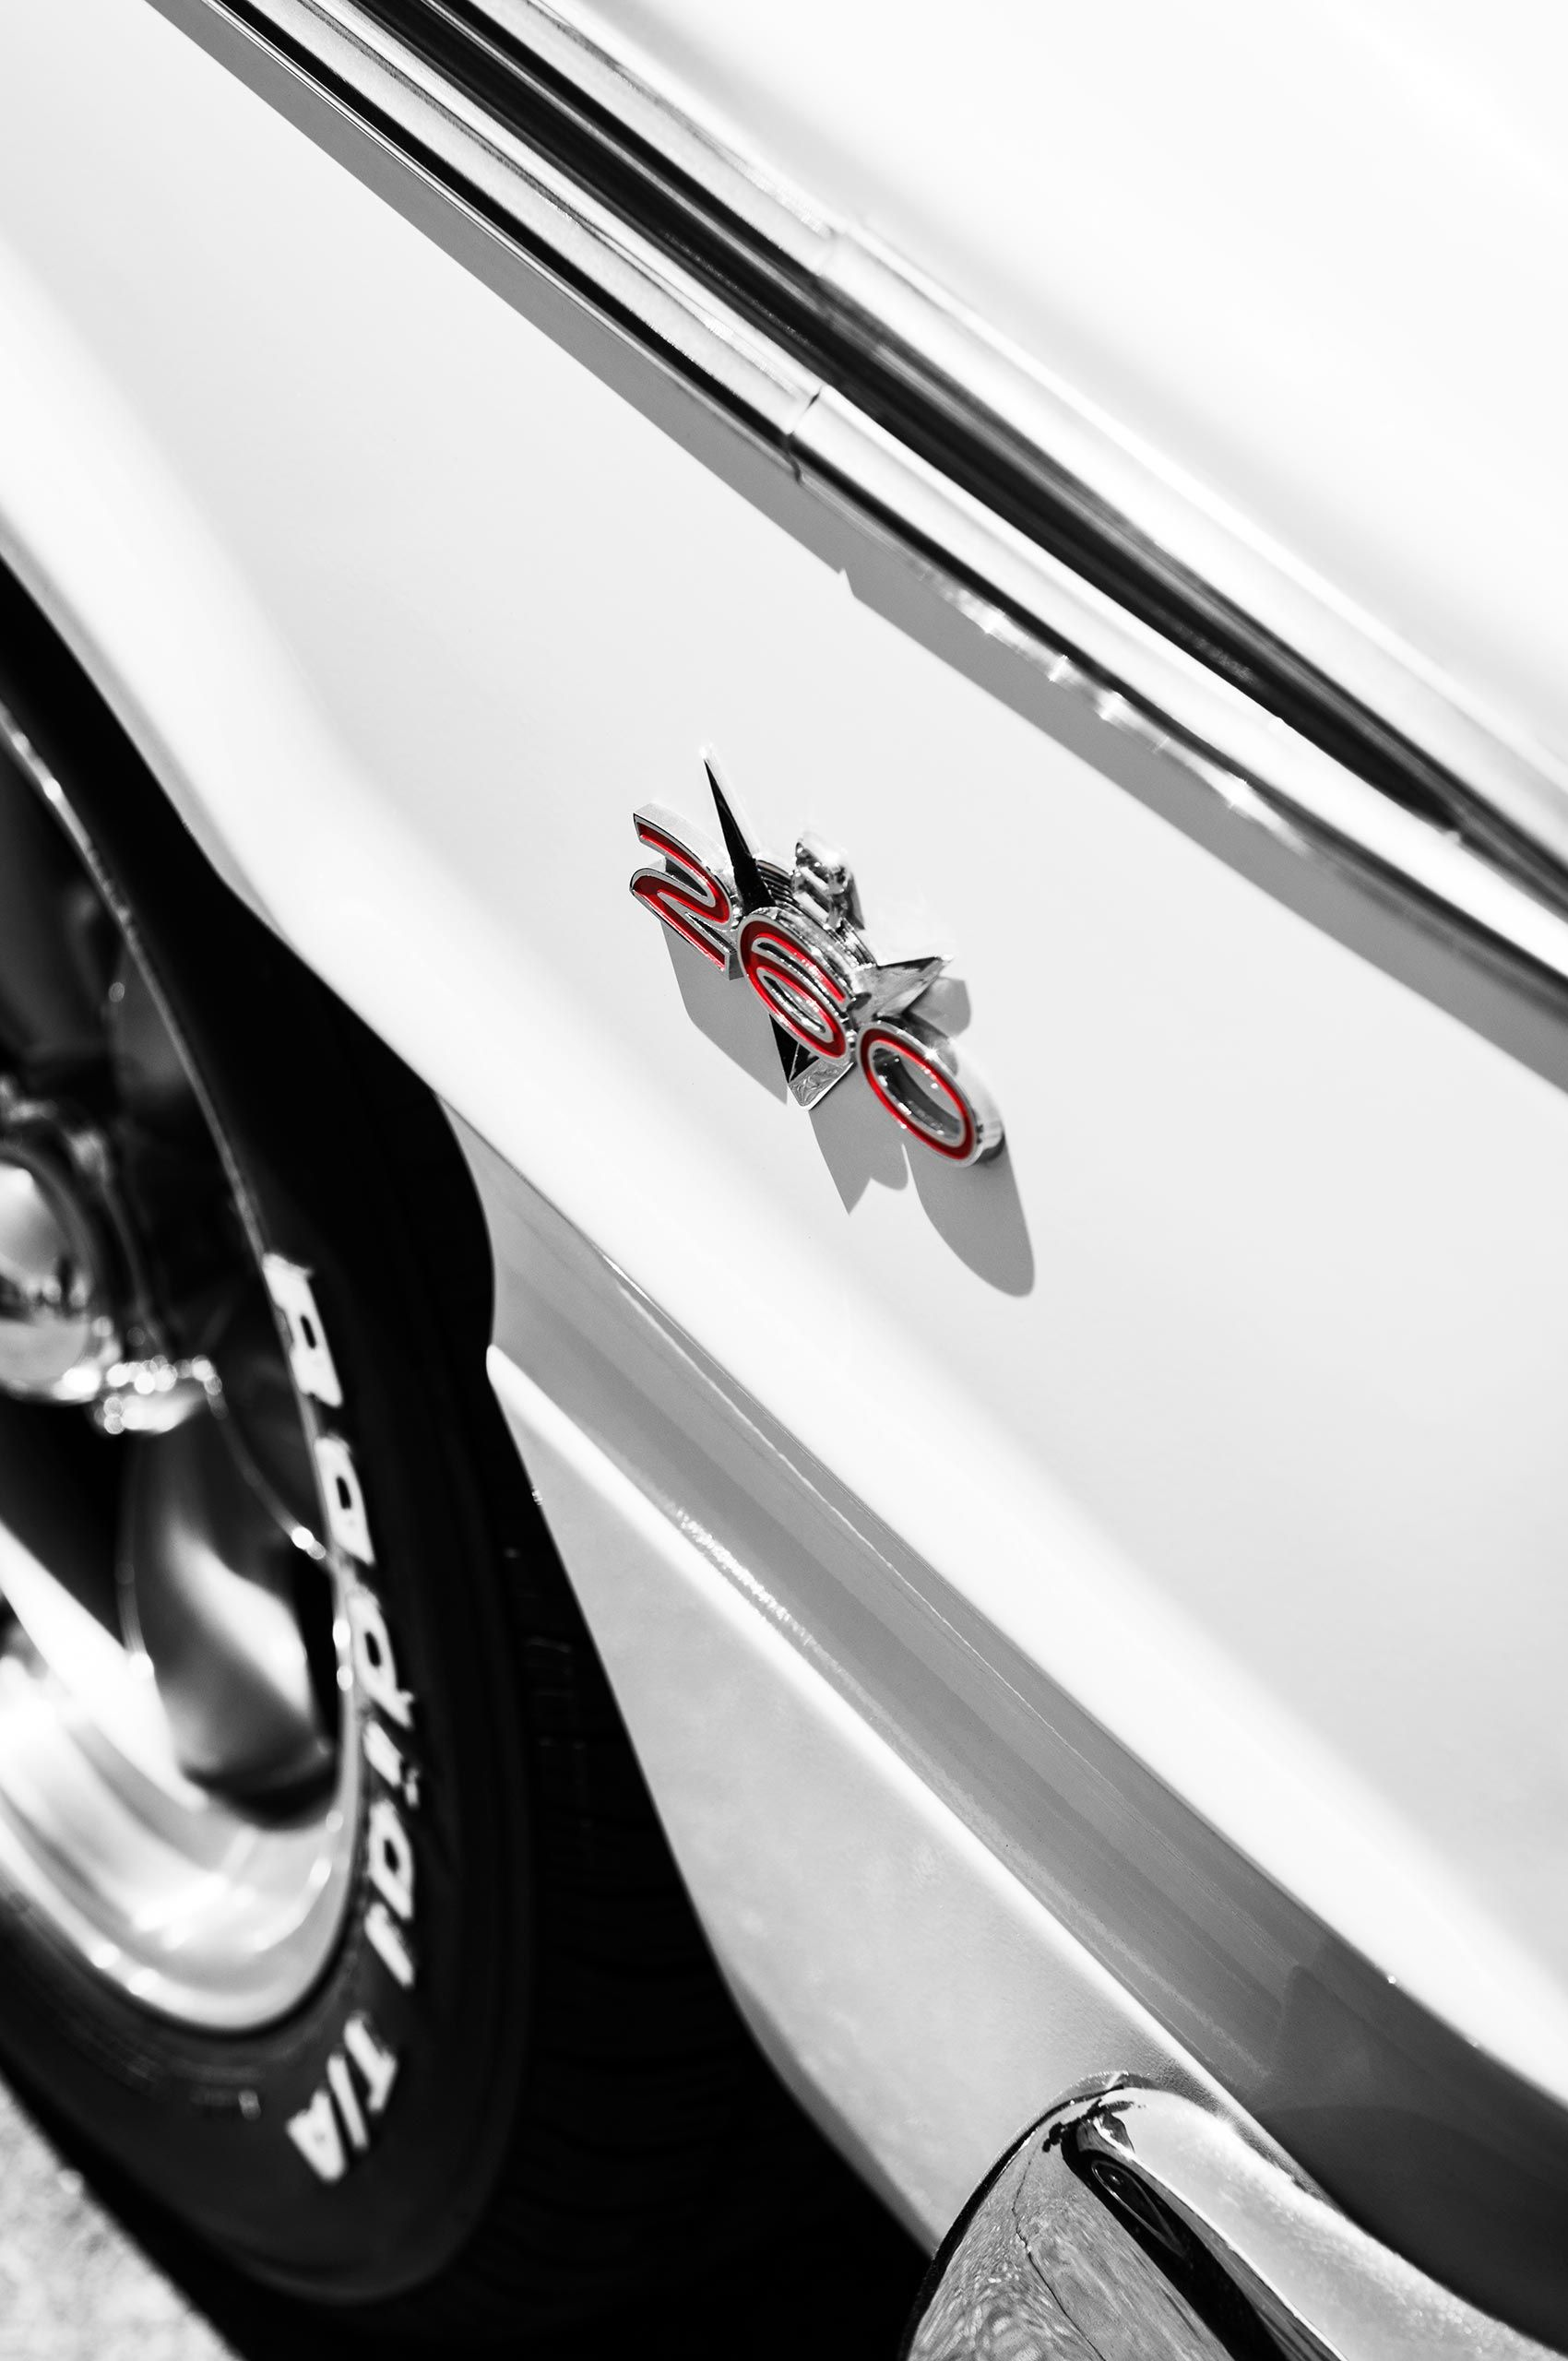 260-car-detail-vivalasvegas-HenrikOlundPhotography.jpg